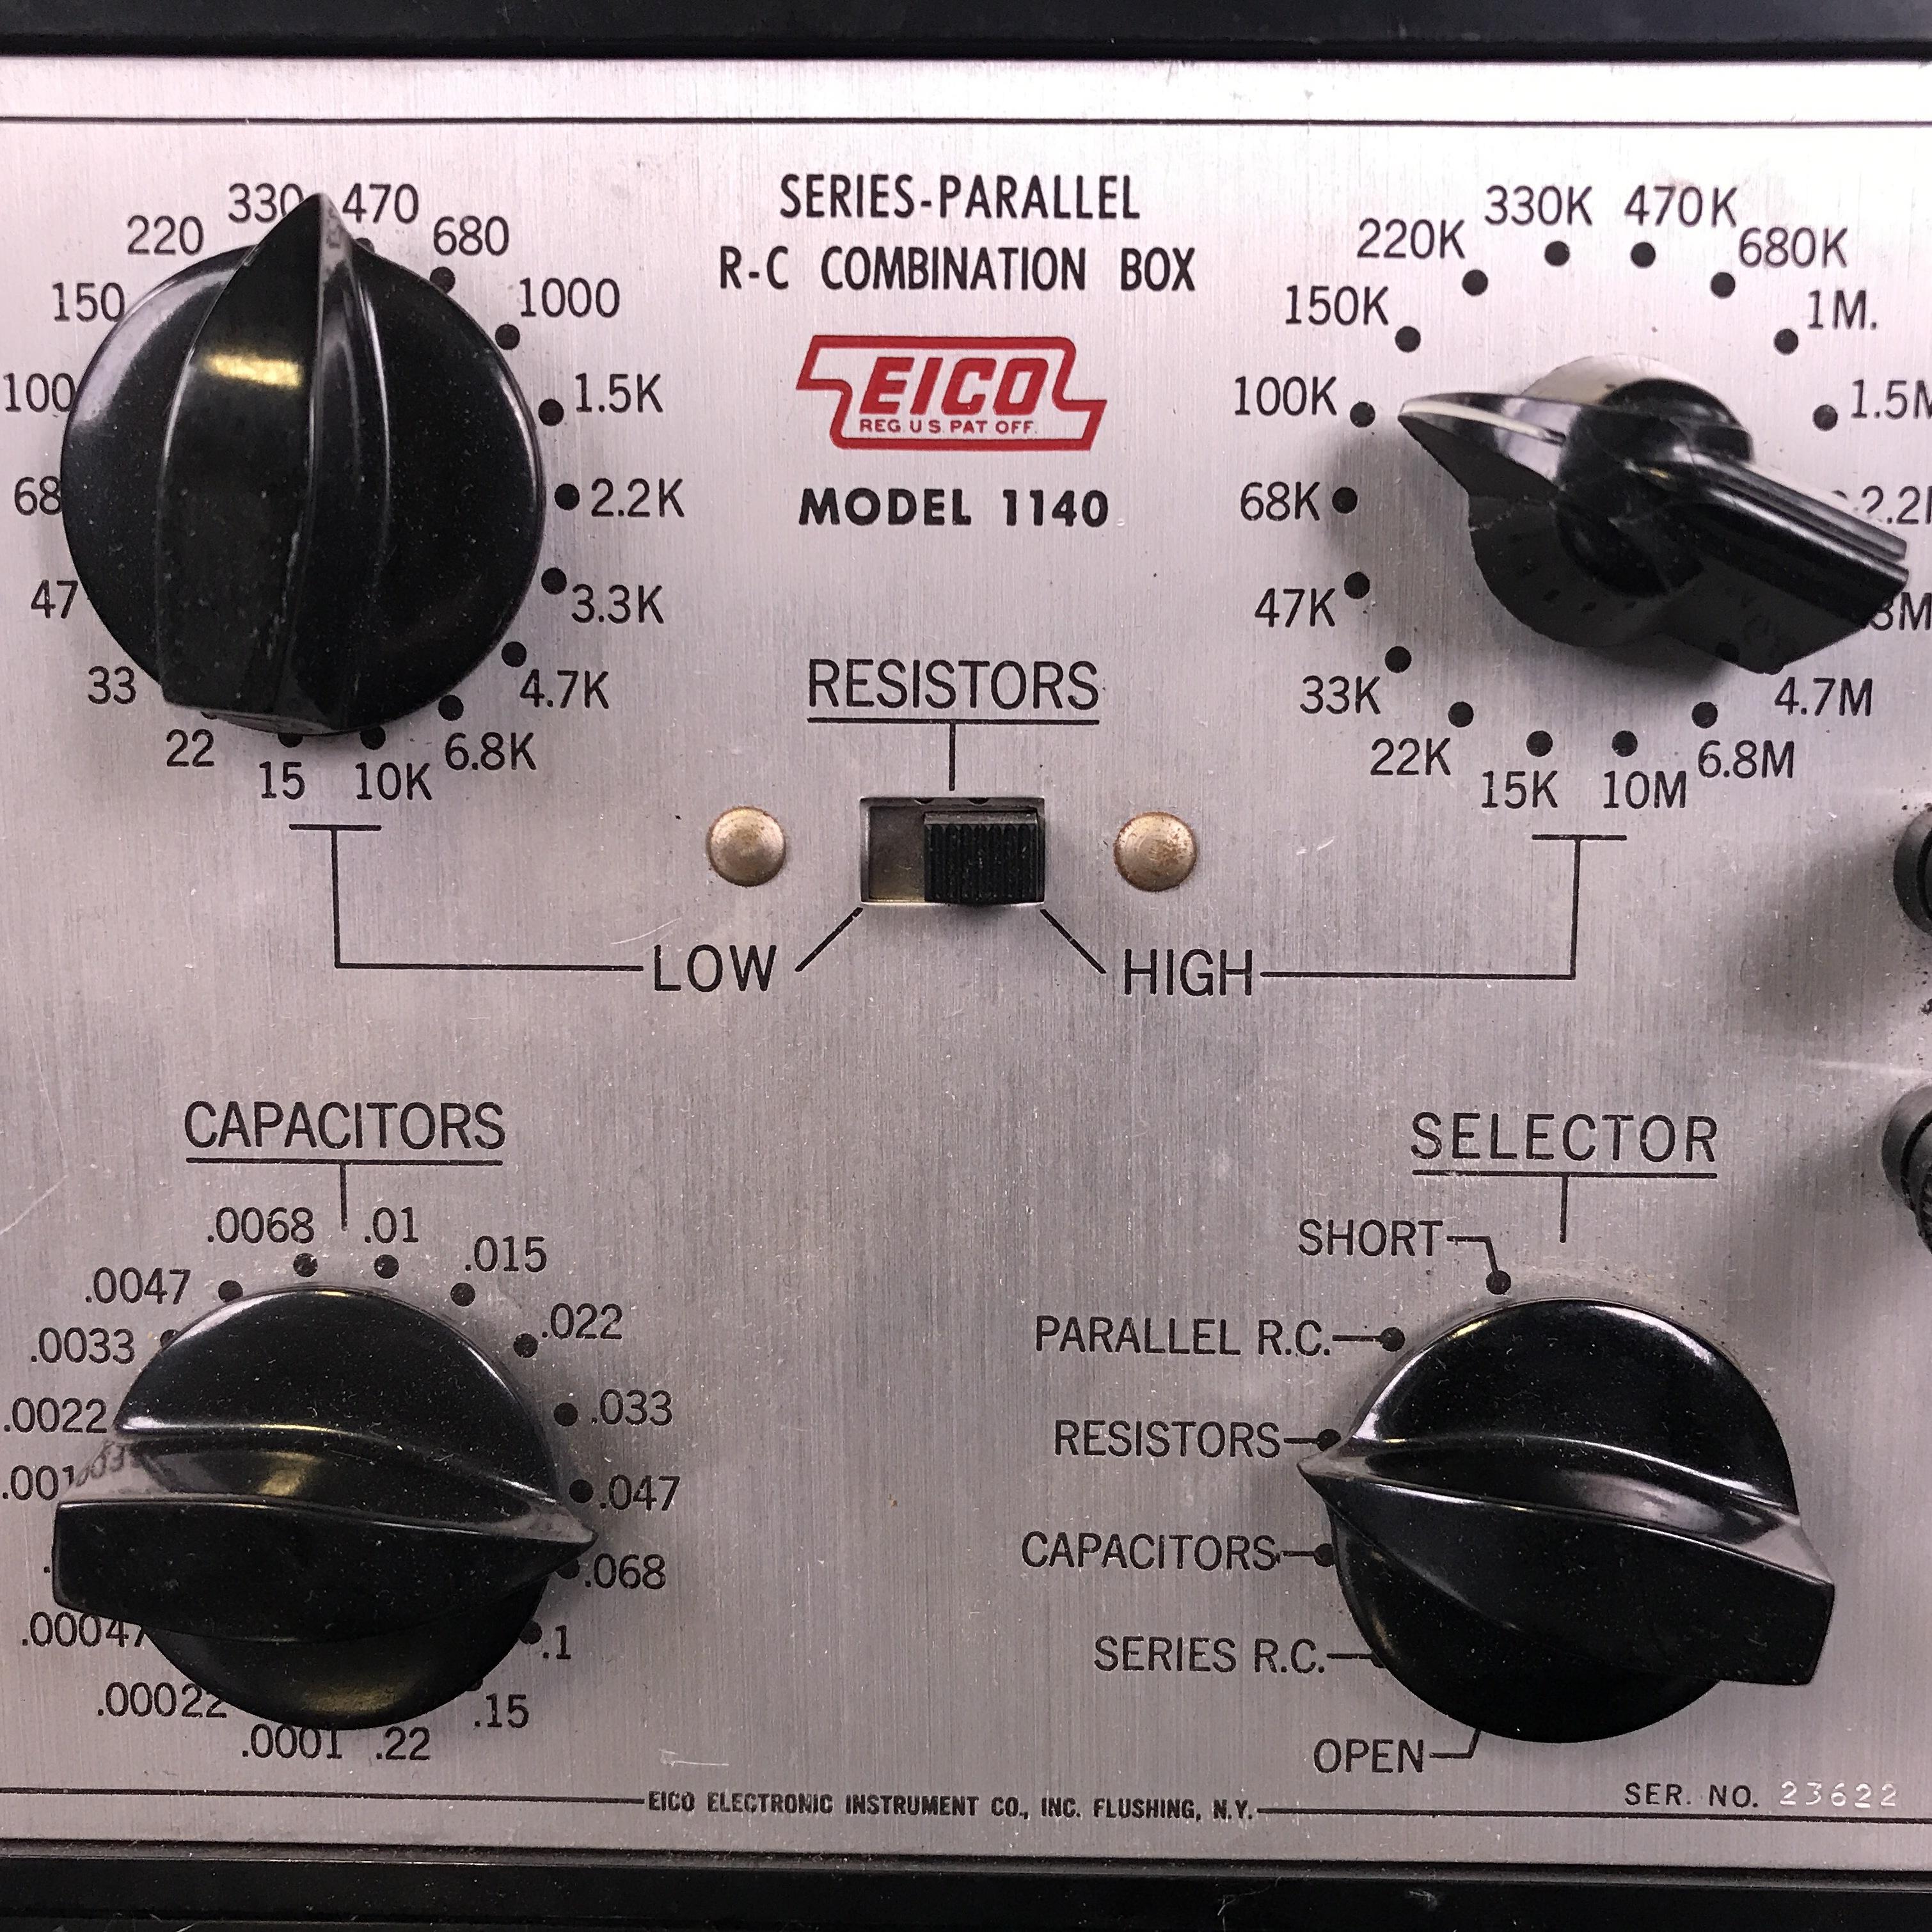 EICO Model 1140 Series-Parallel R-C Combination Box Image